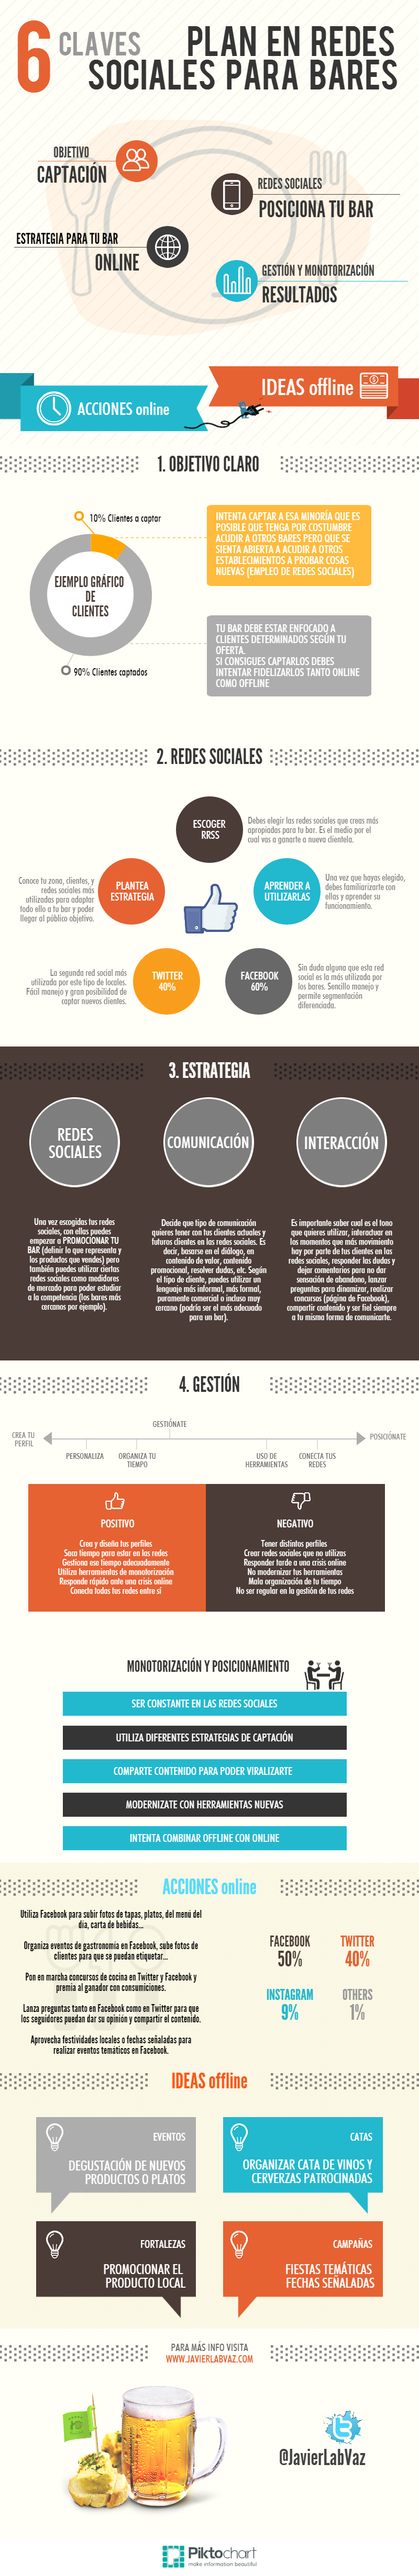 Plan Social Media para Bares (Infografia)